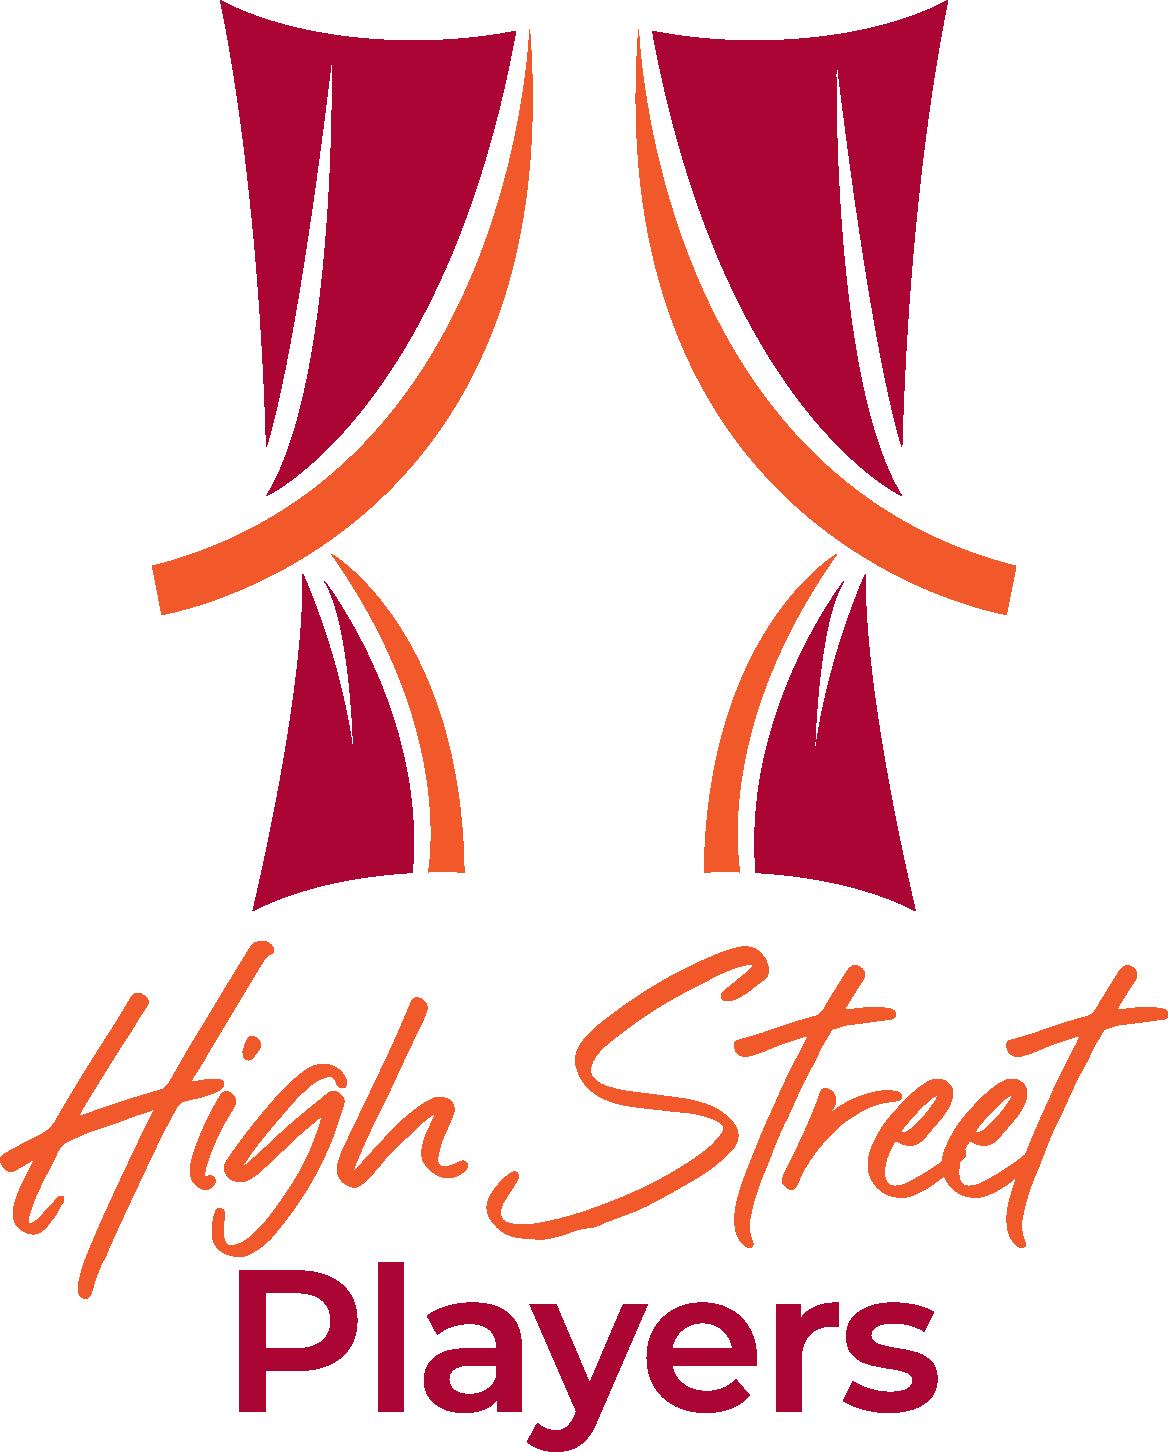 High Street Players